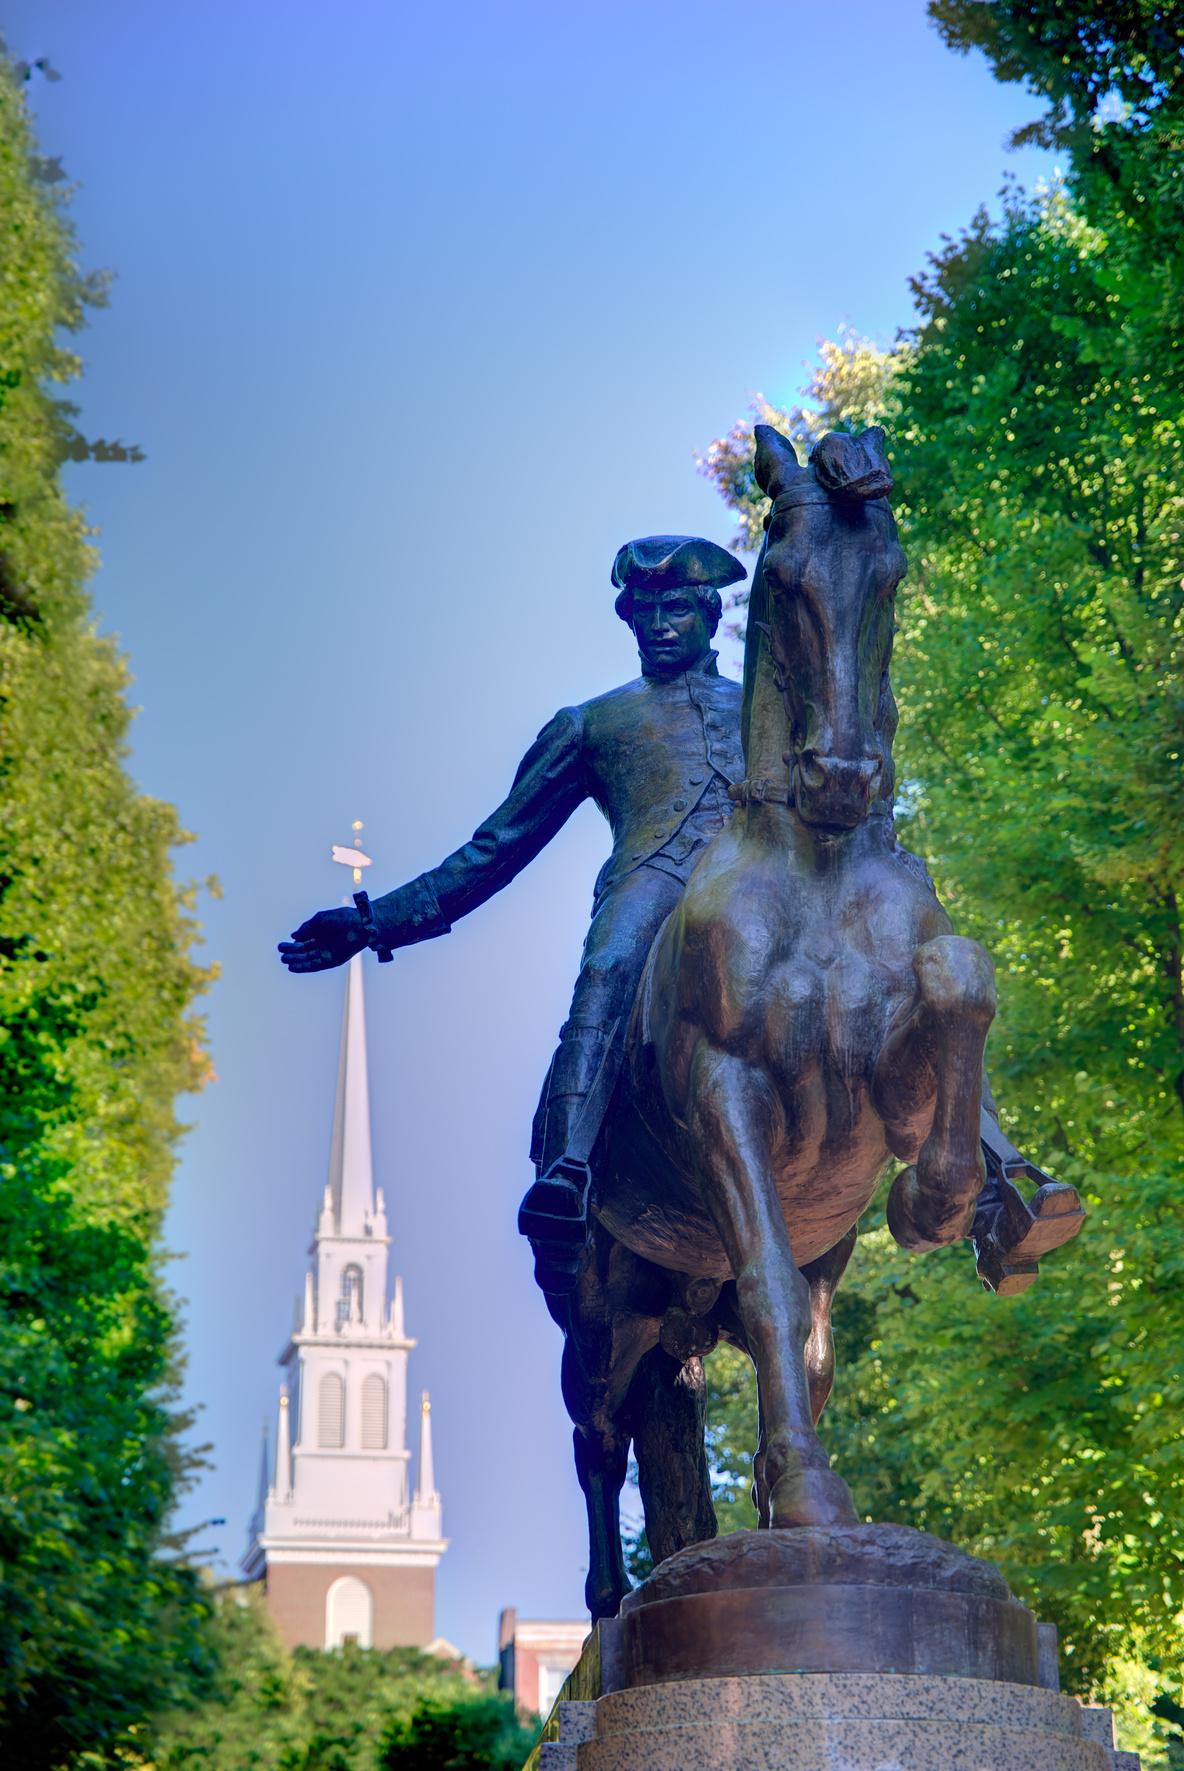 048762023-boston-paul-revere-mall-statue.jpeg